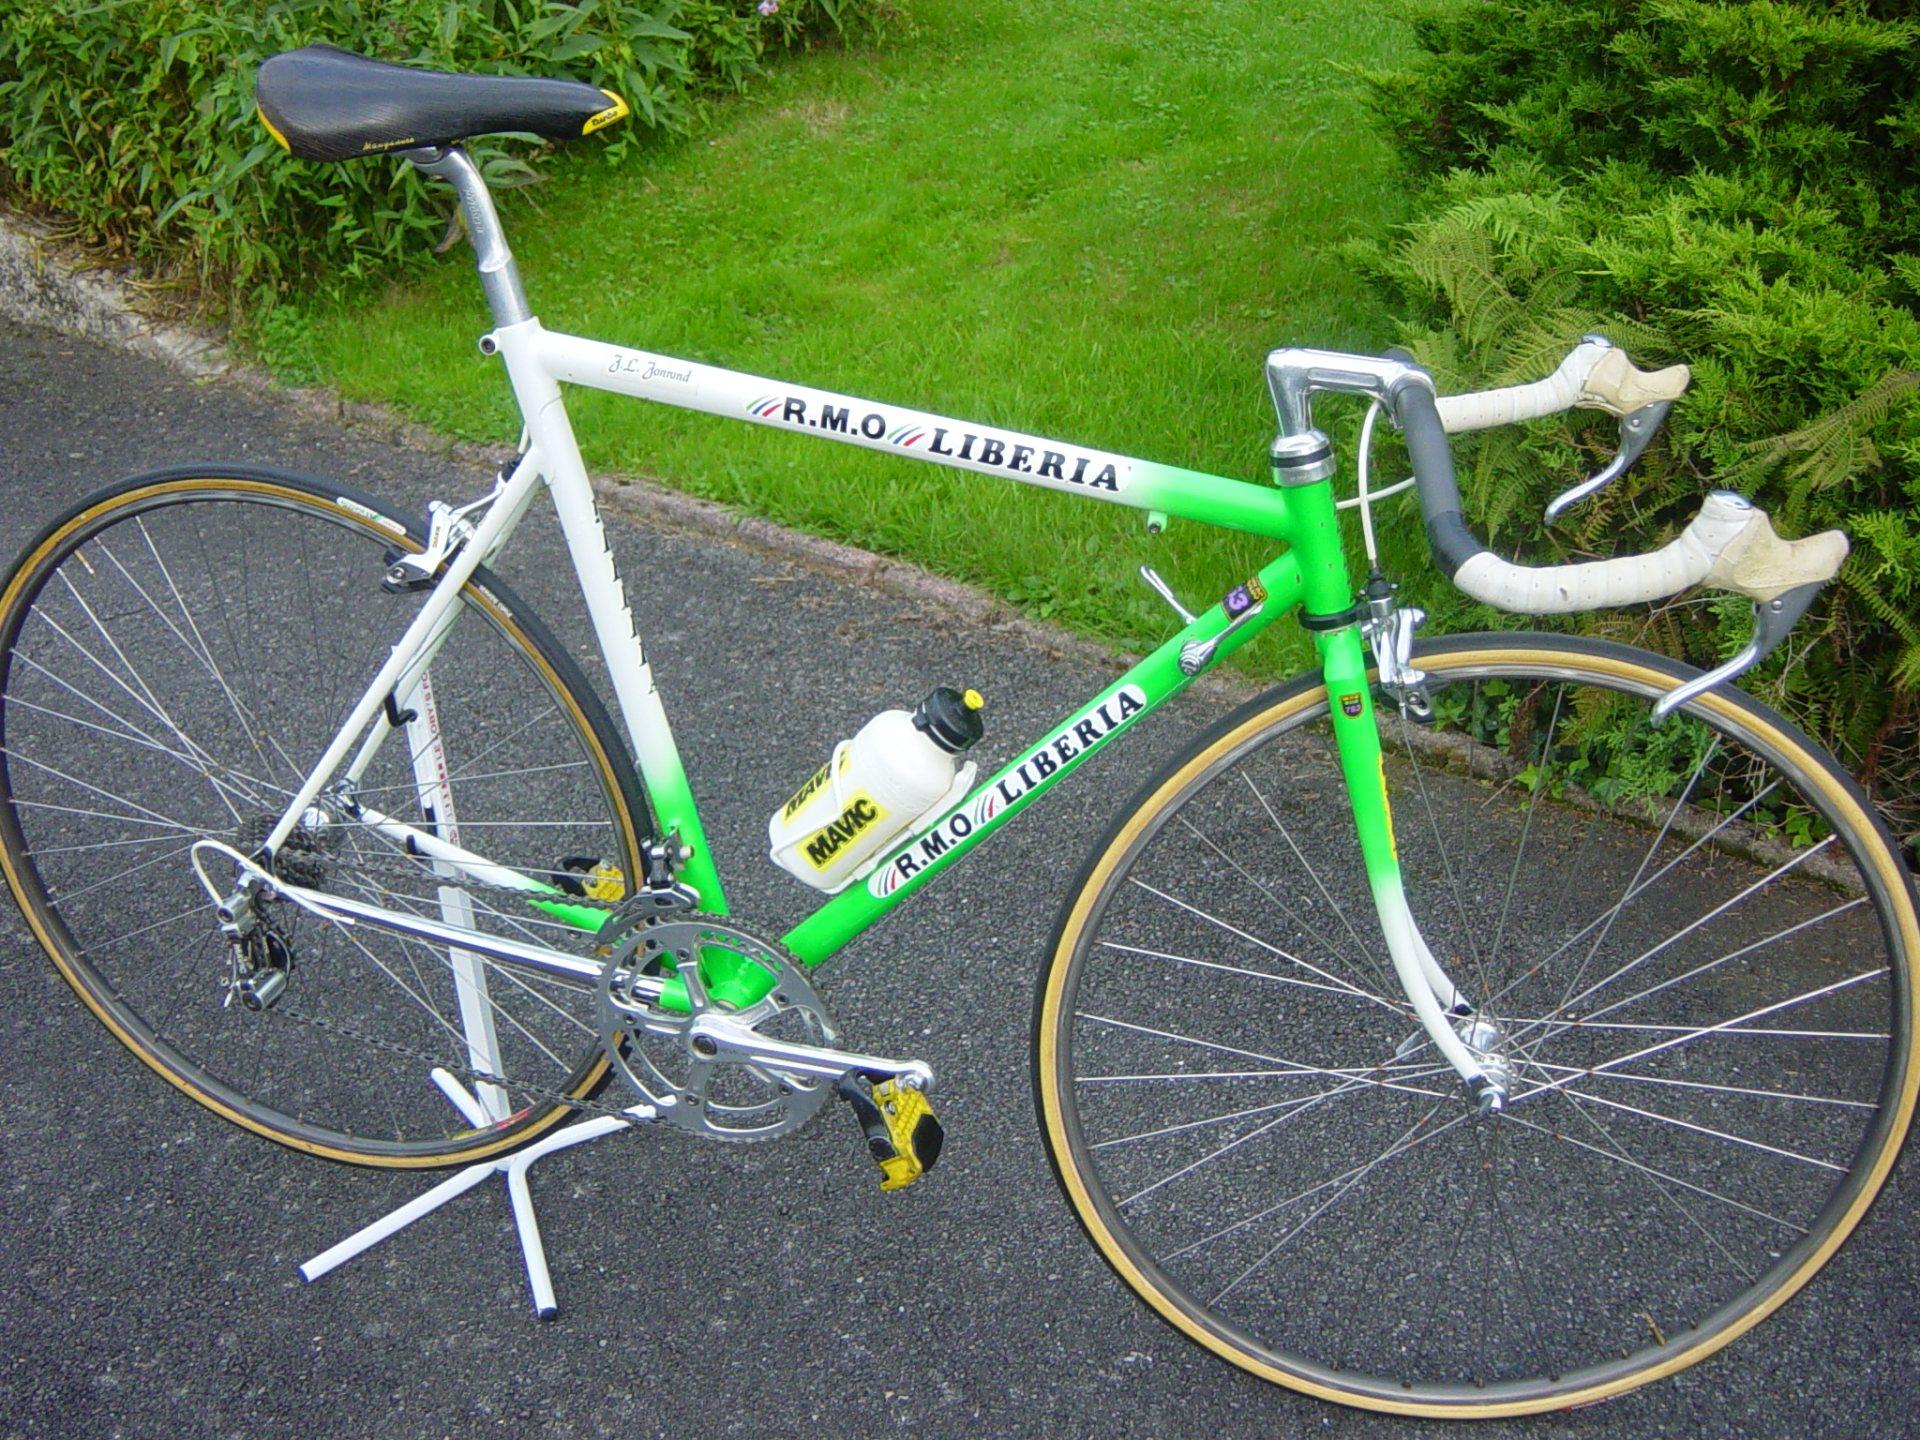 Liberia RMO 1990 713447bvlottmavic